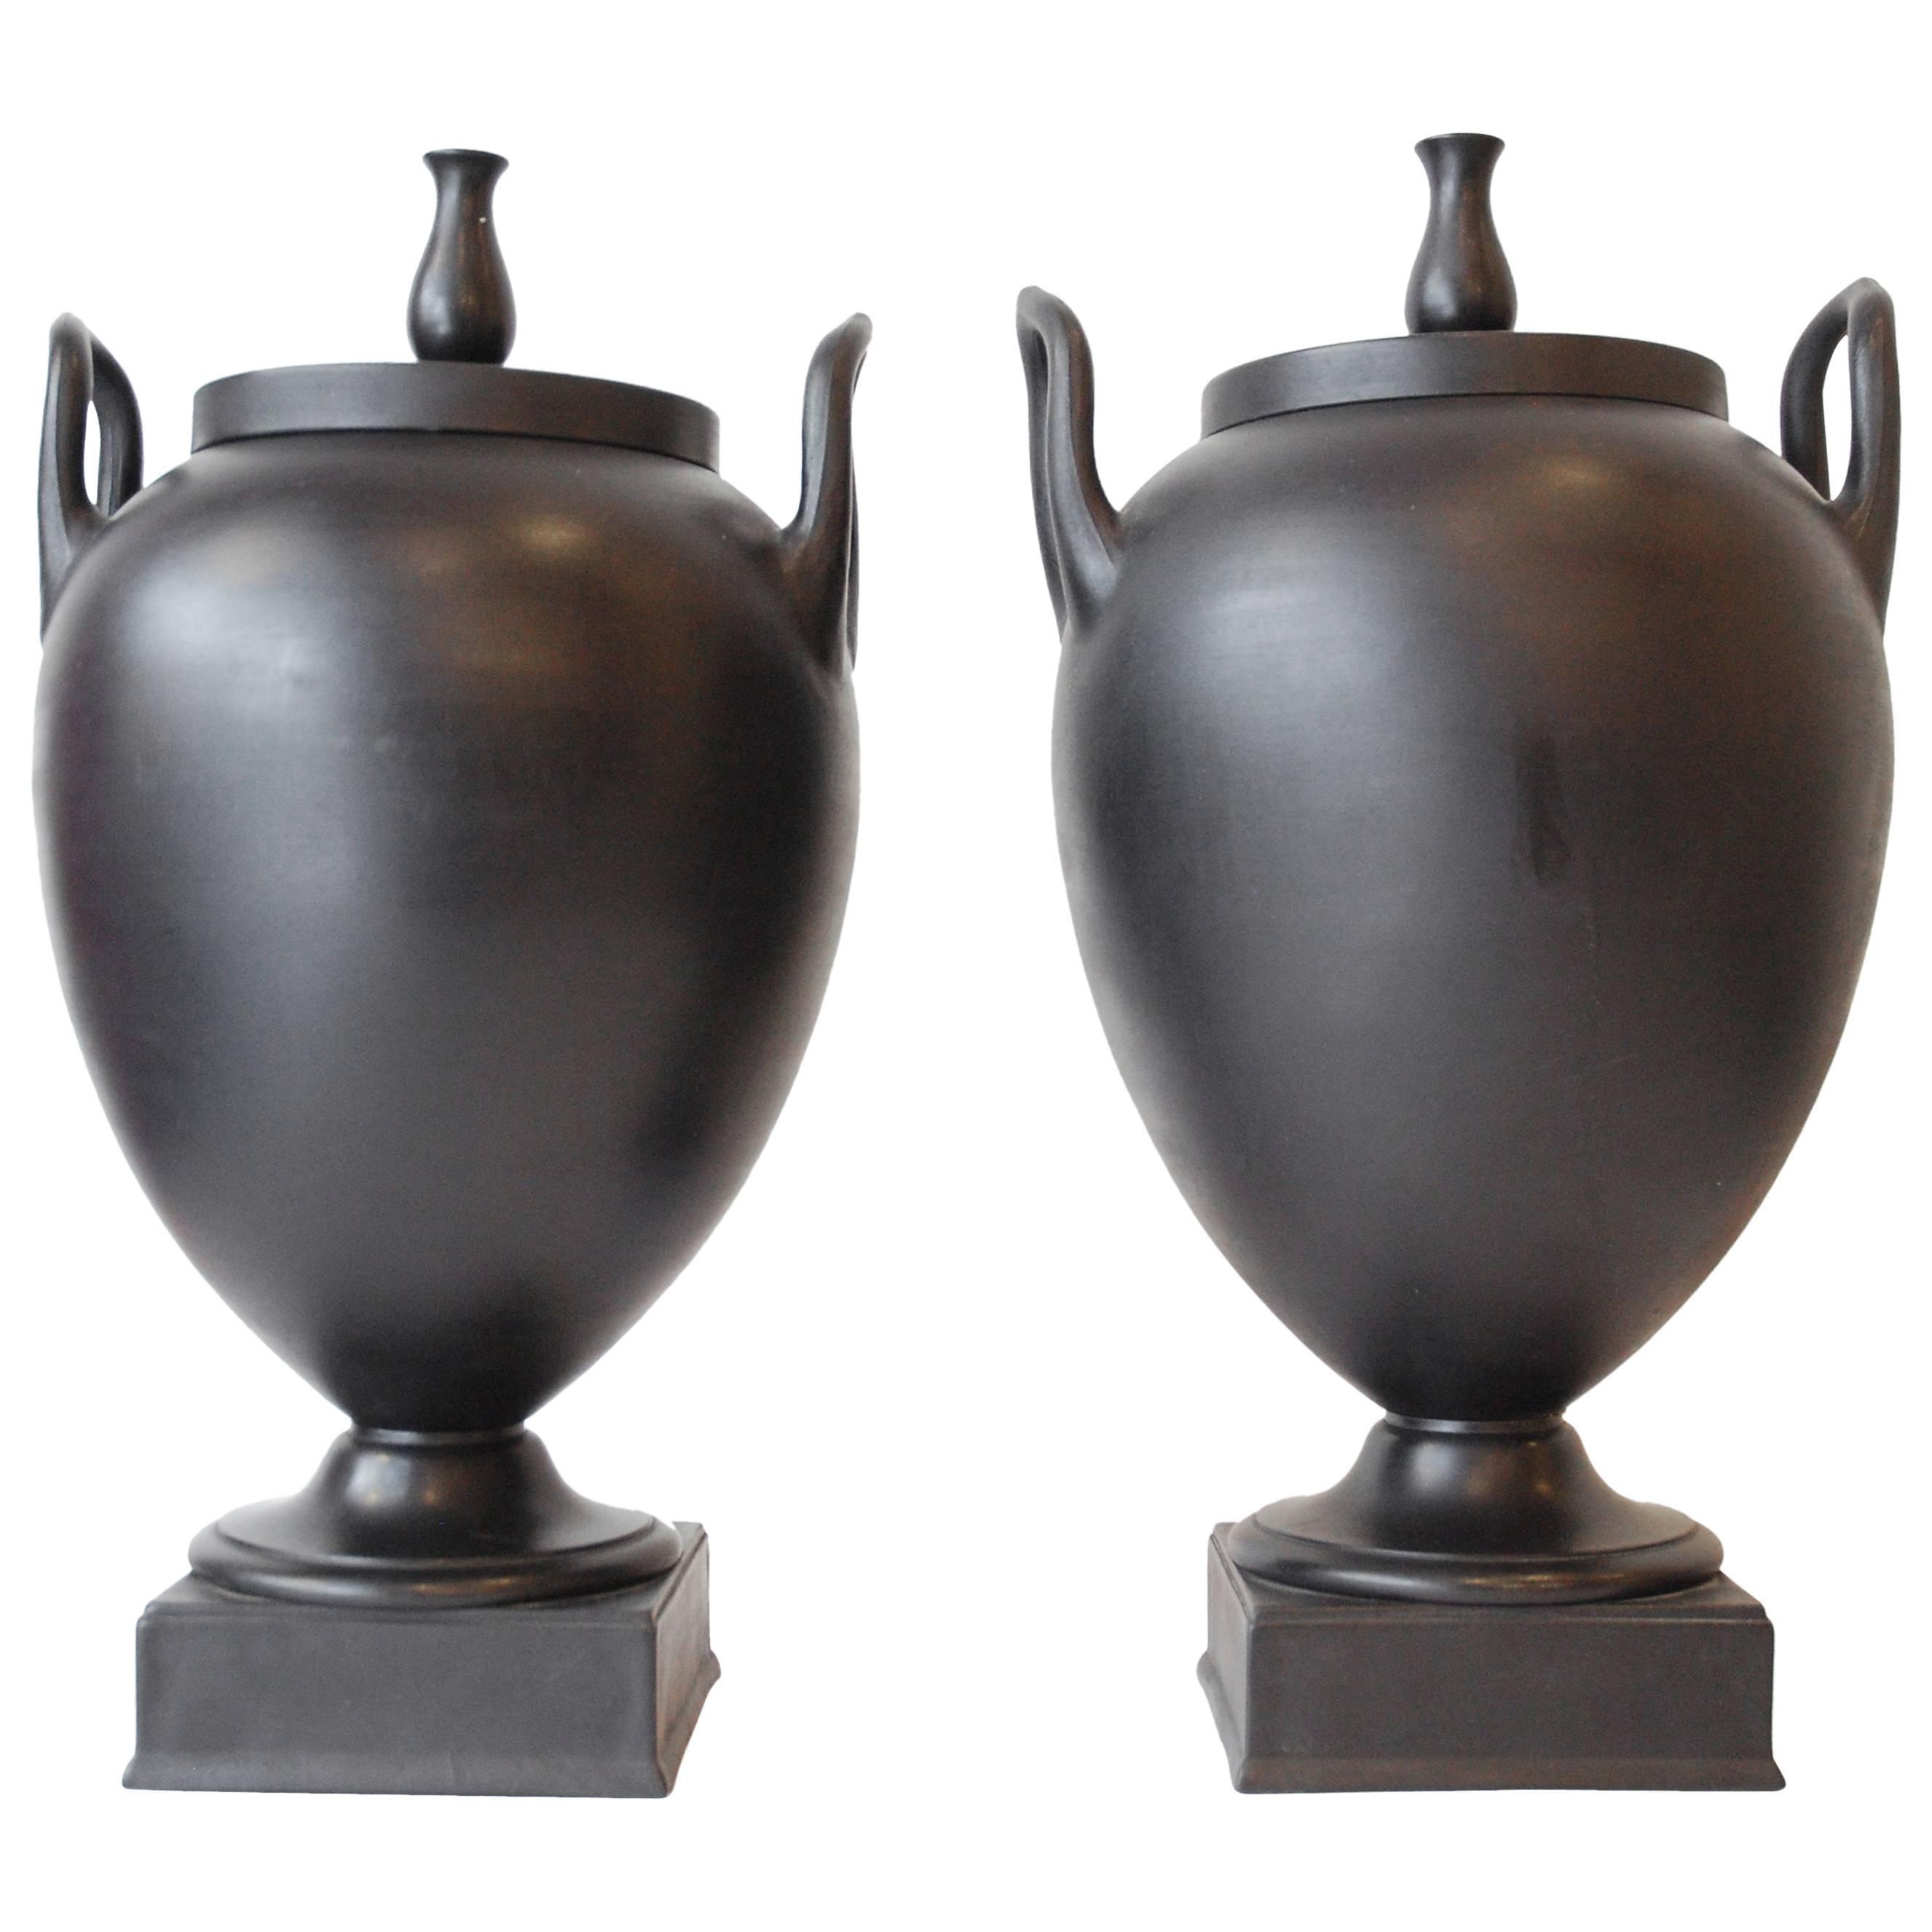 Pair of Large Basalt Vases, Wedgwood, circa 1900